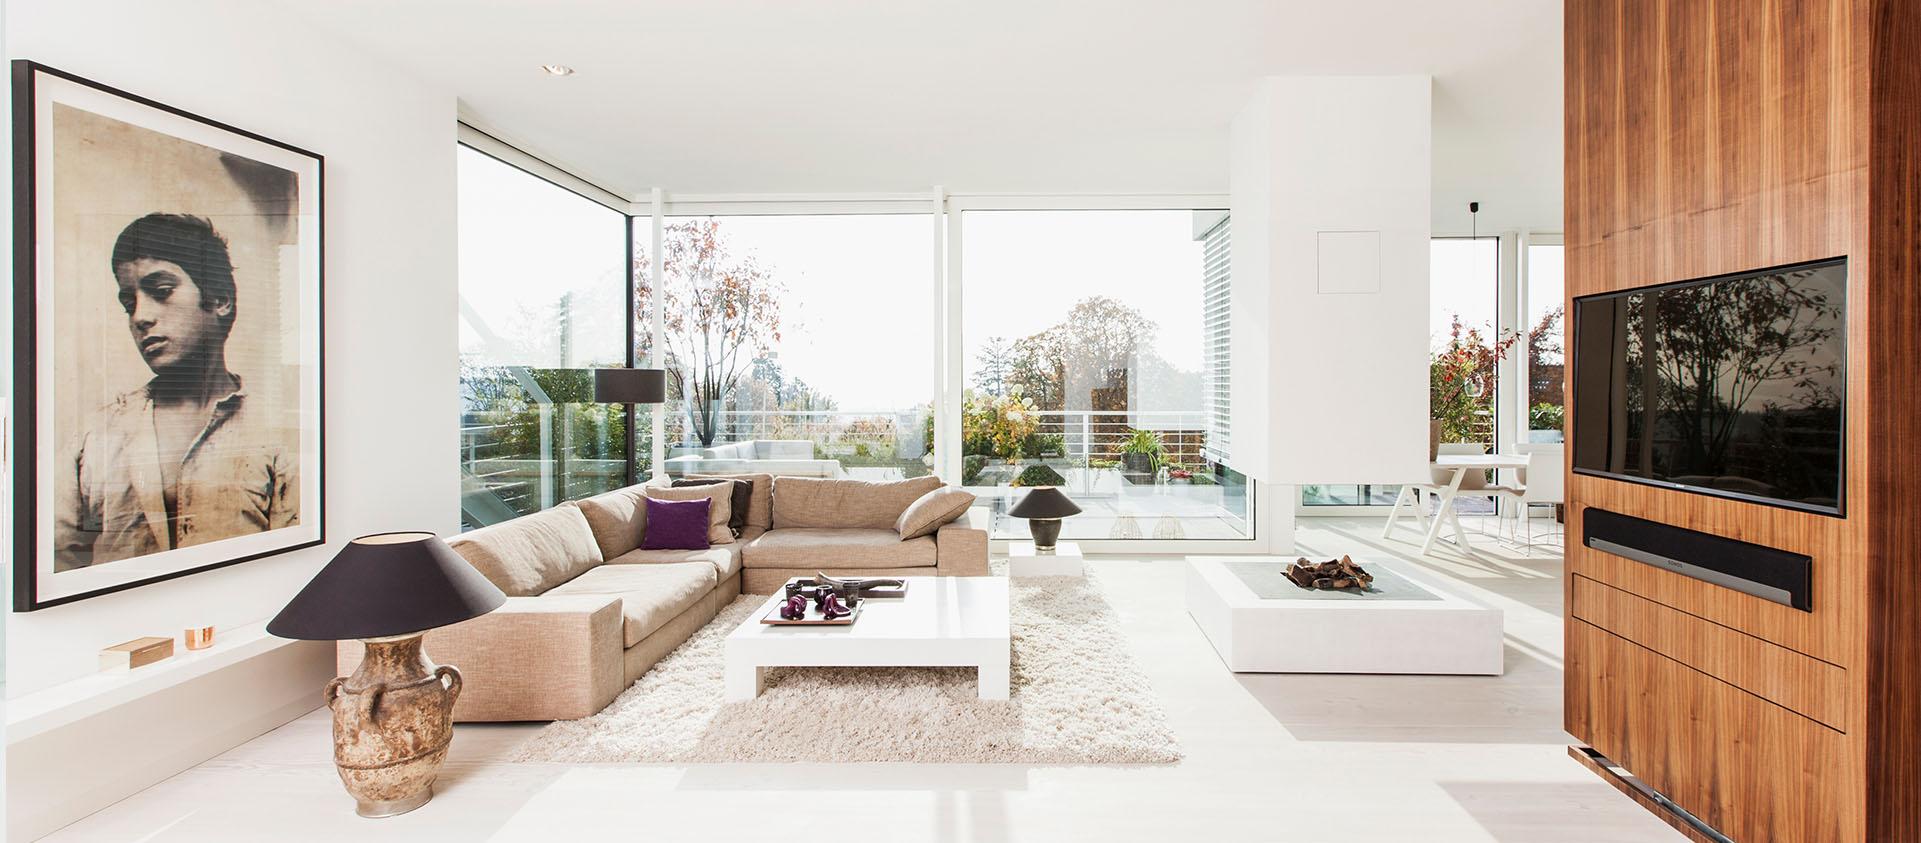 Penthouse Wohnbereich Interieur Design Eberhard Horn Designgruppe Königstein